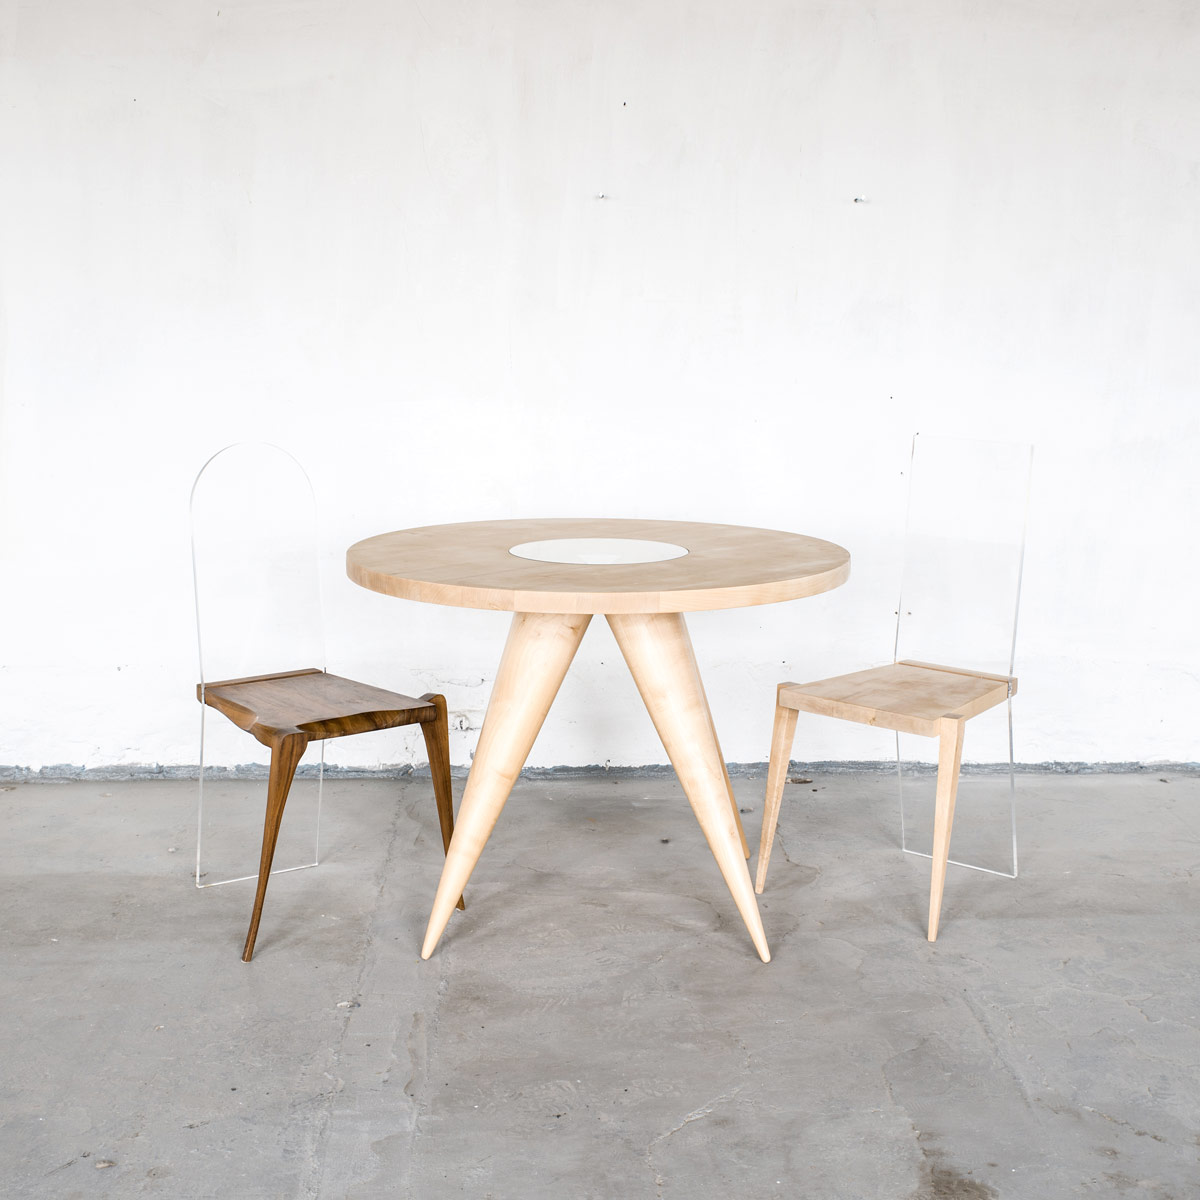 Stuhl KALLISTUS, Stuhl FIDELIS, Tisch MARIKEN, JK. Designermöbel